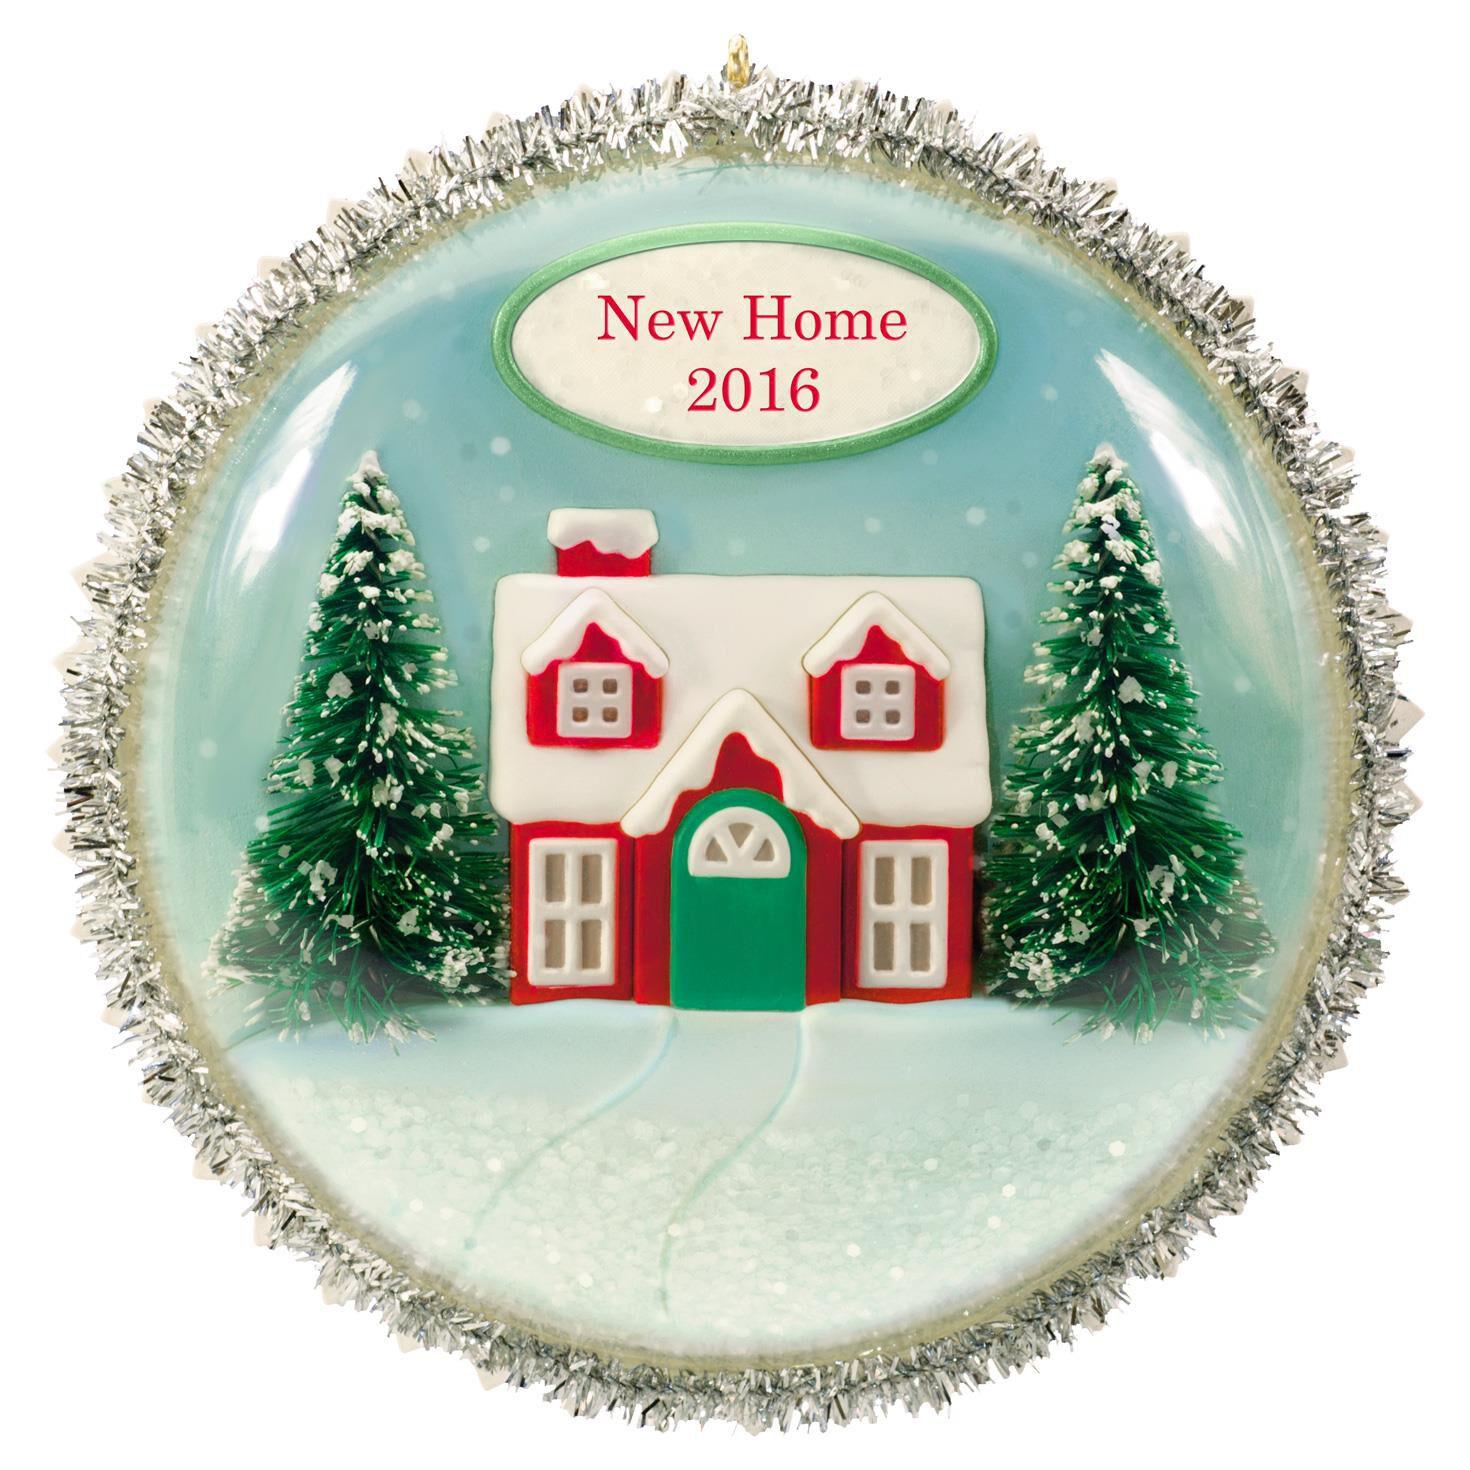 New Home Holiday Ornament - Keepsake Ornaments - Hallmark